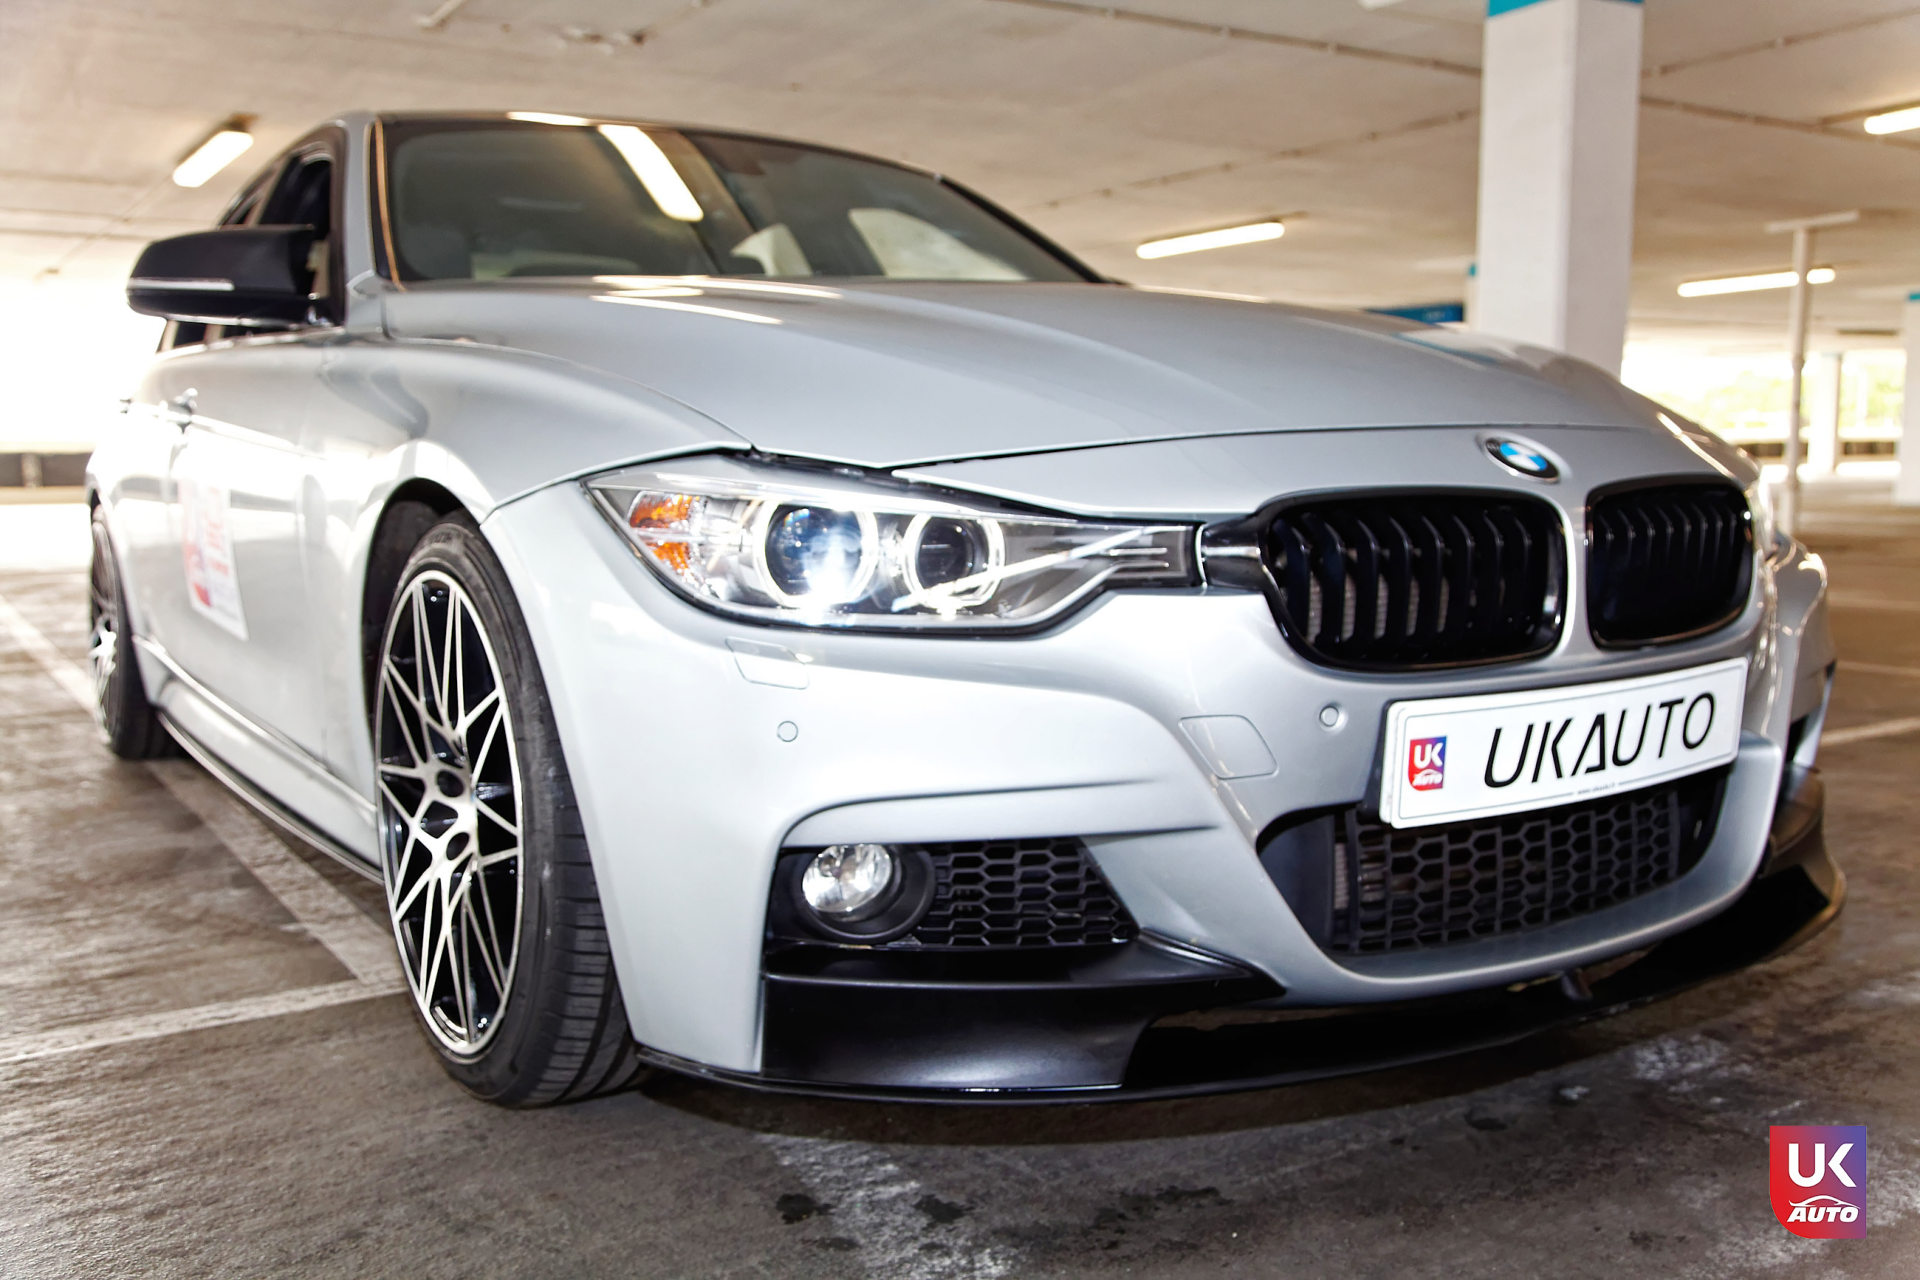 Bmw 335I IMPORT F30 eric drouet import bmw occasion rhd mandataire bmw angleterre6 DxO - IMPORTATION BMW 335 I FELICITATION A ERIC DROUET BMW VOITURE SPORTIVE UK